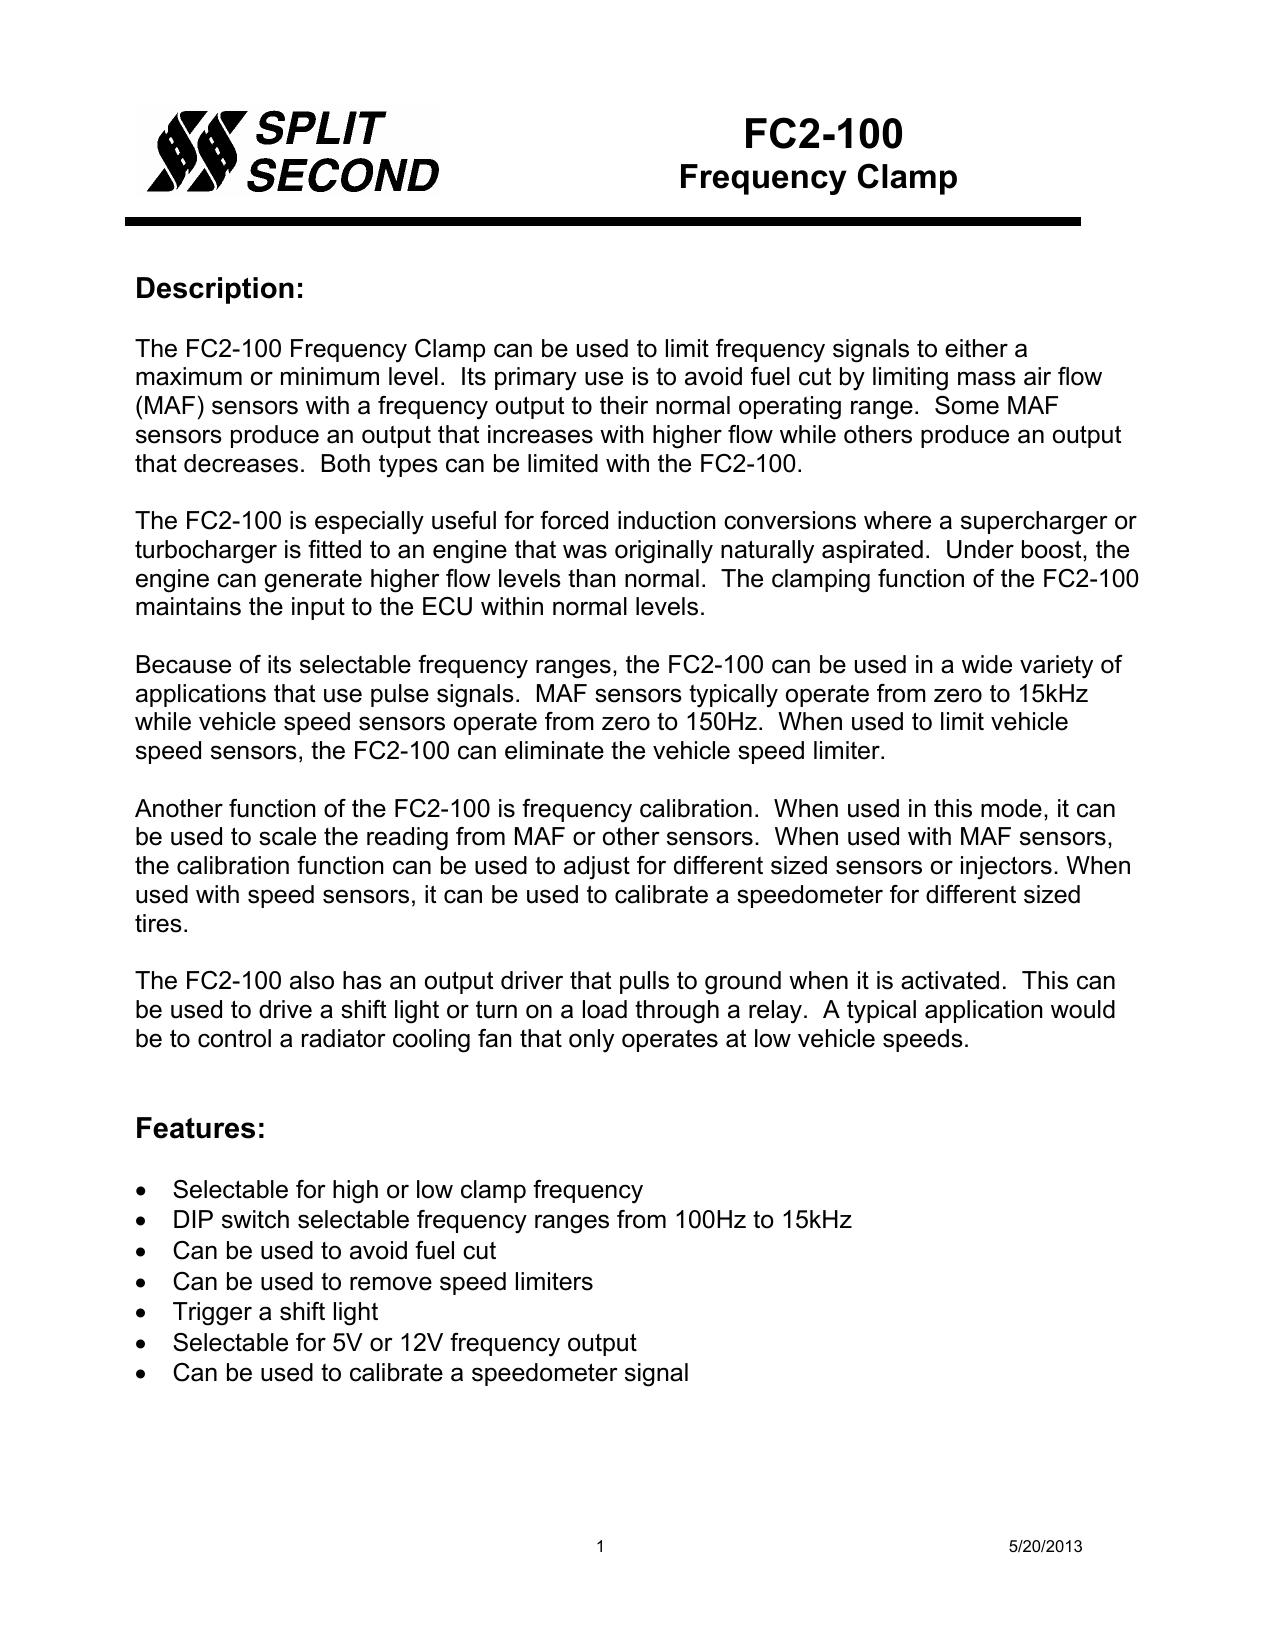 FC2-100 Frequency Clamp Data Sheet | manualzz com